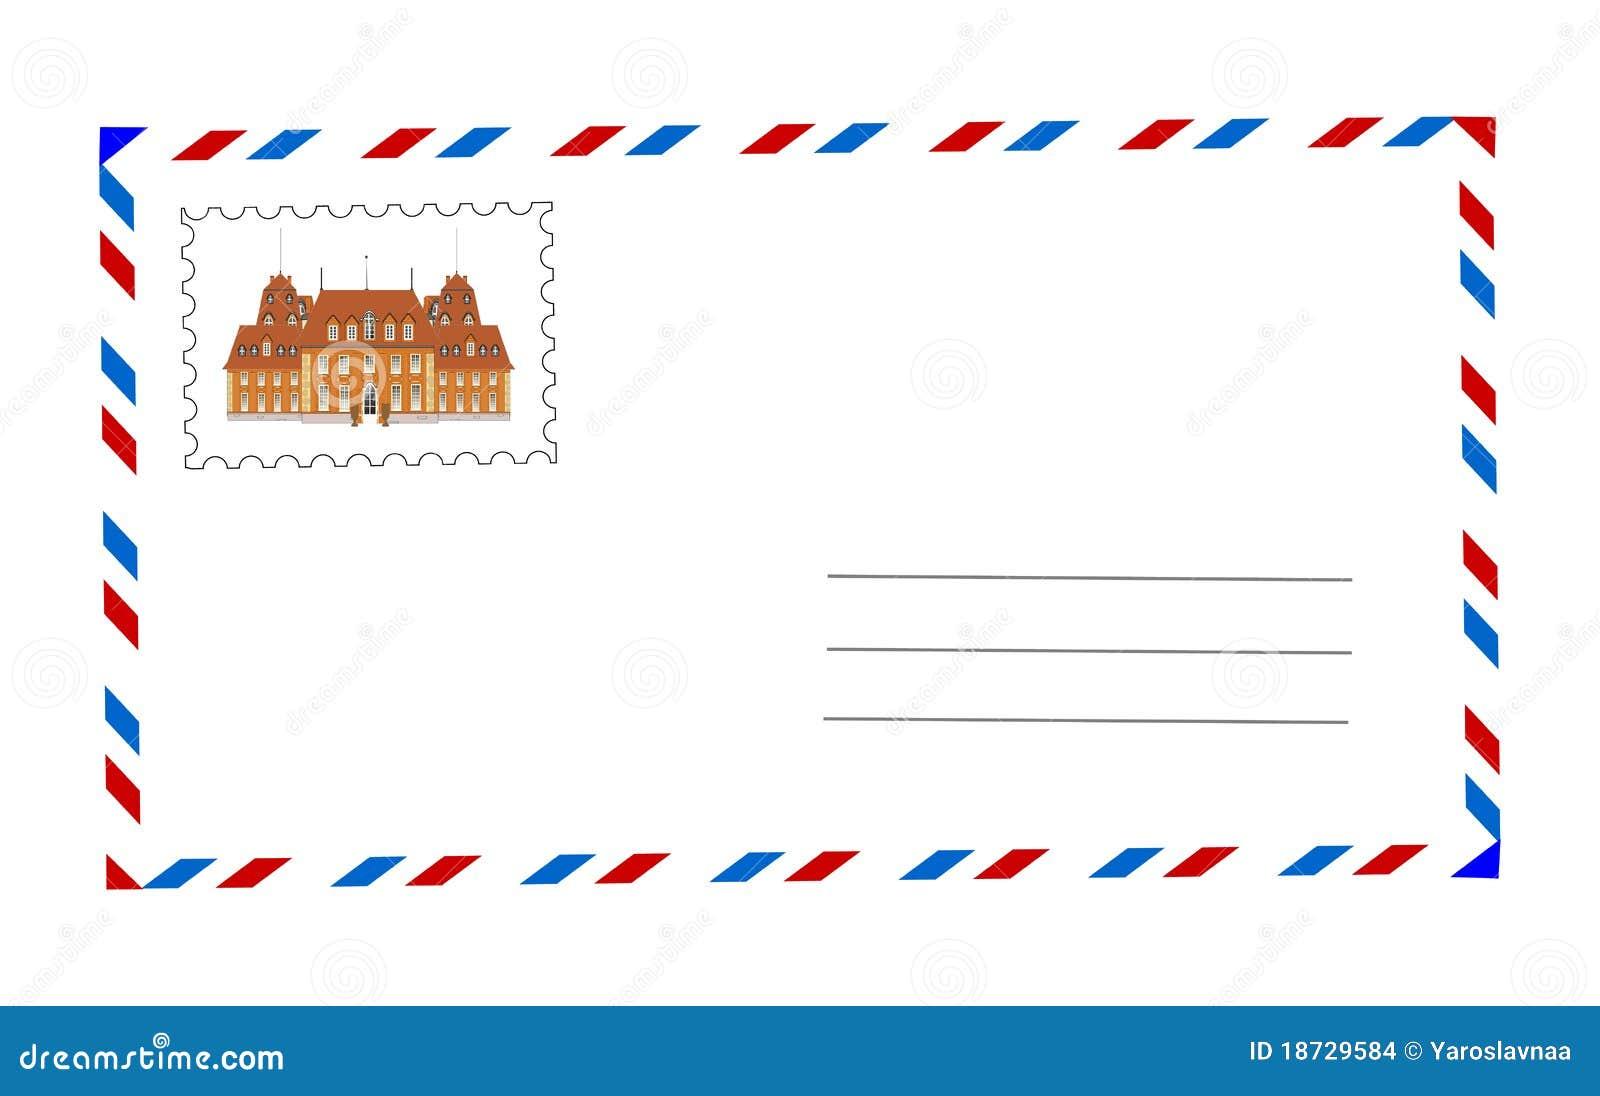 Envelope And Postage Stamp Illustration Stock Images - Image: 18729584